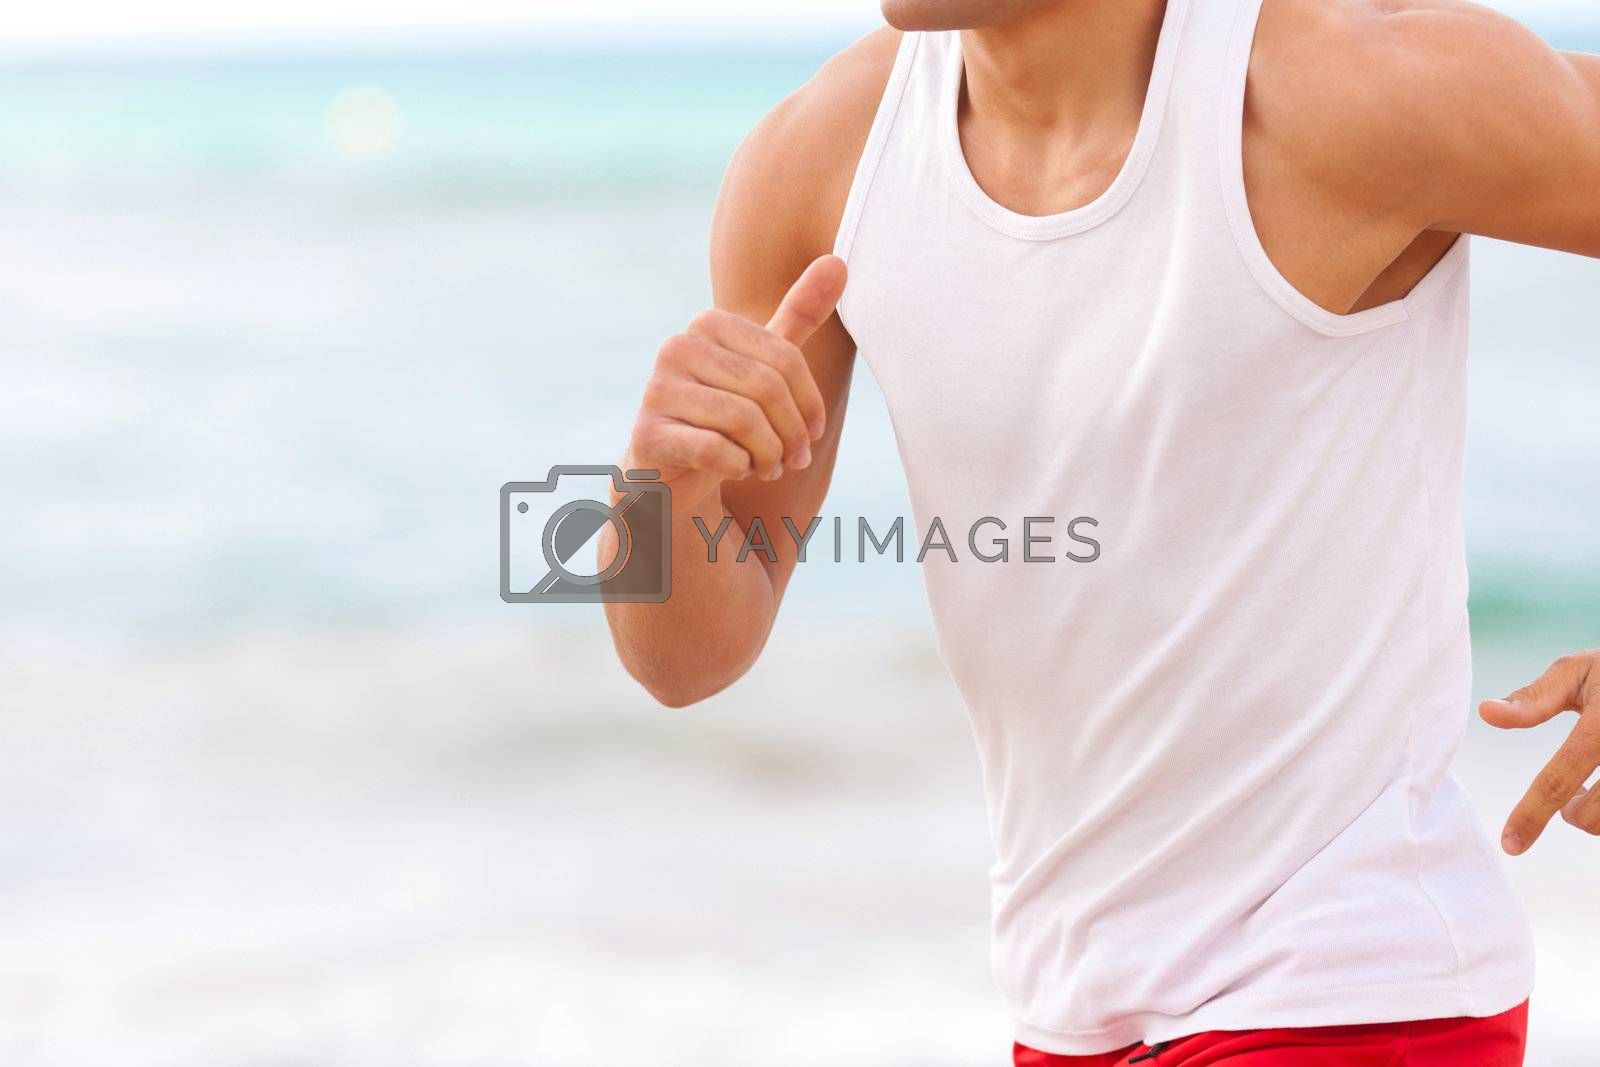 man chest closep jogging on the beach white t-shirt